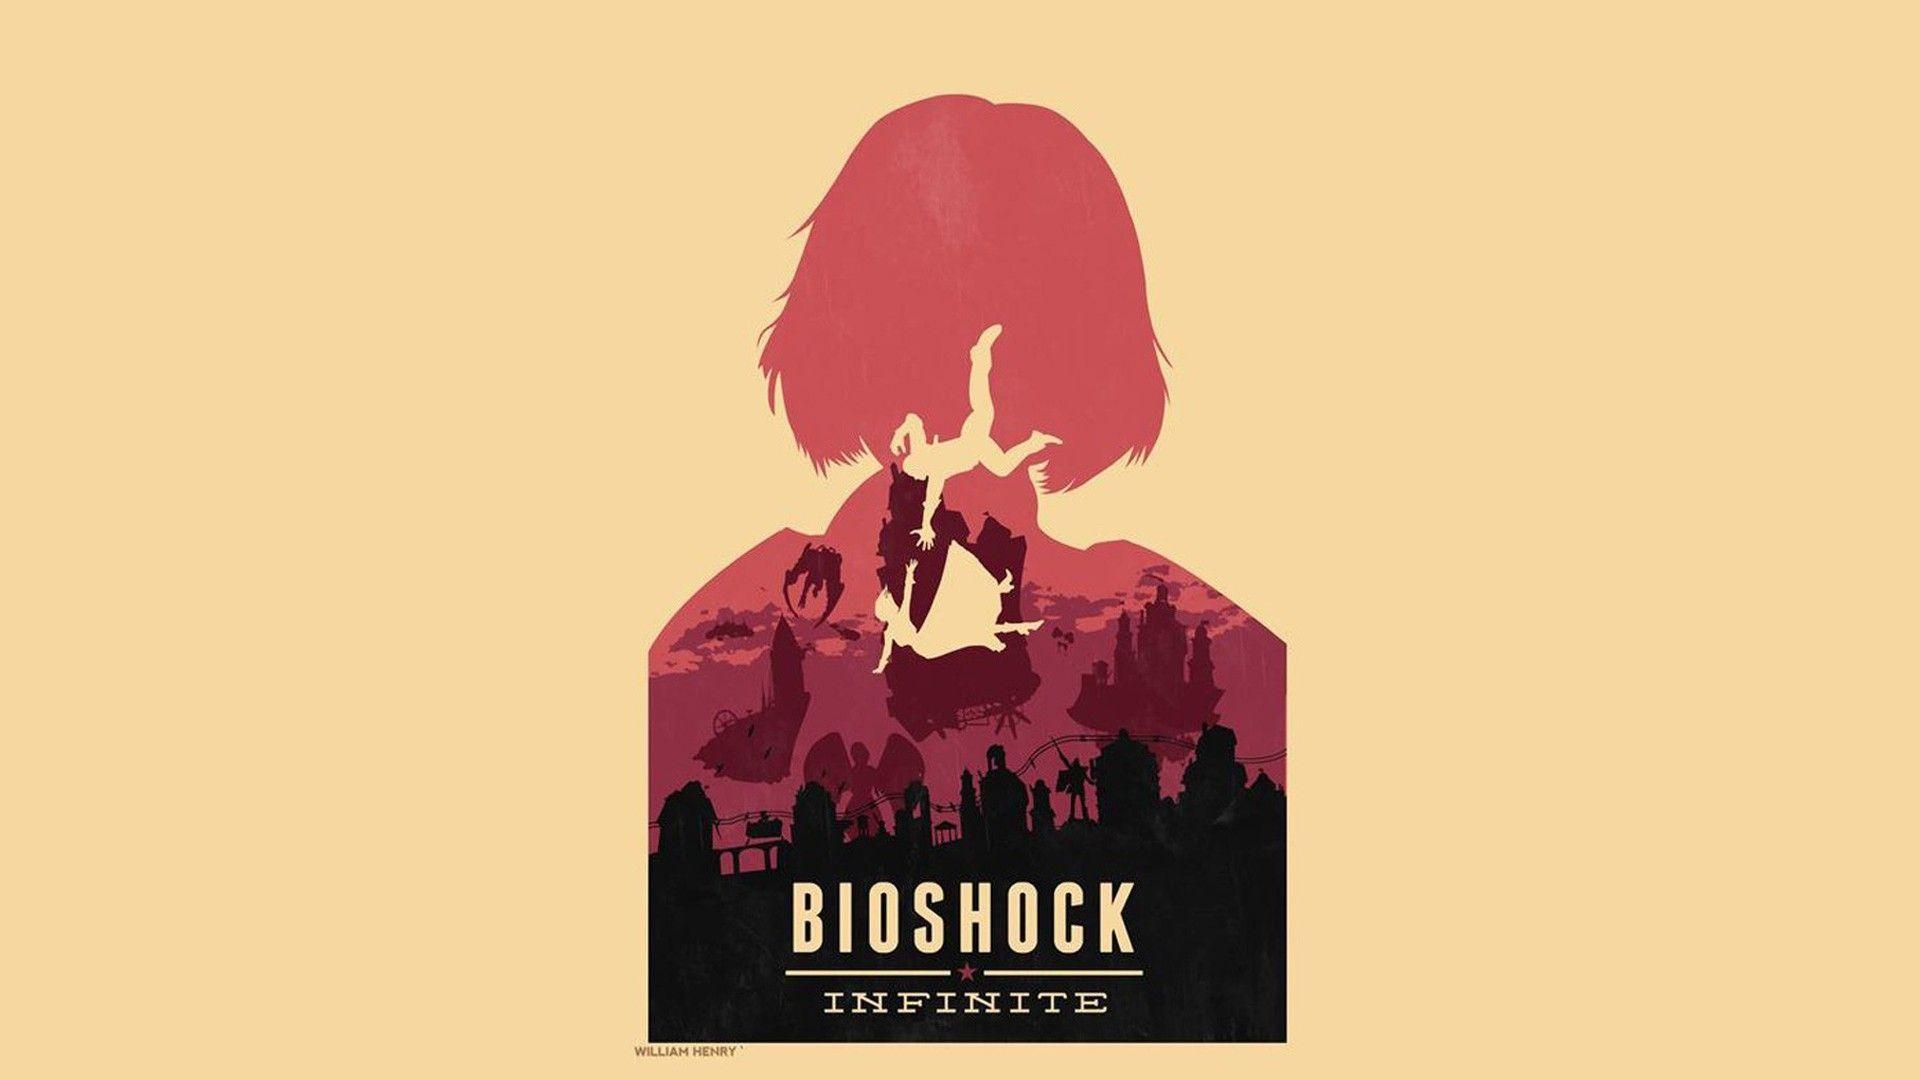 183 Bioshock Infinite Wallpapers | Bioshock Infinite Backgrounds .